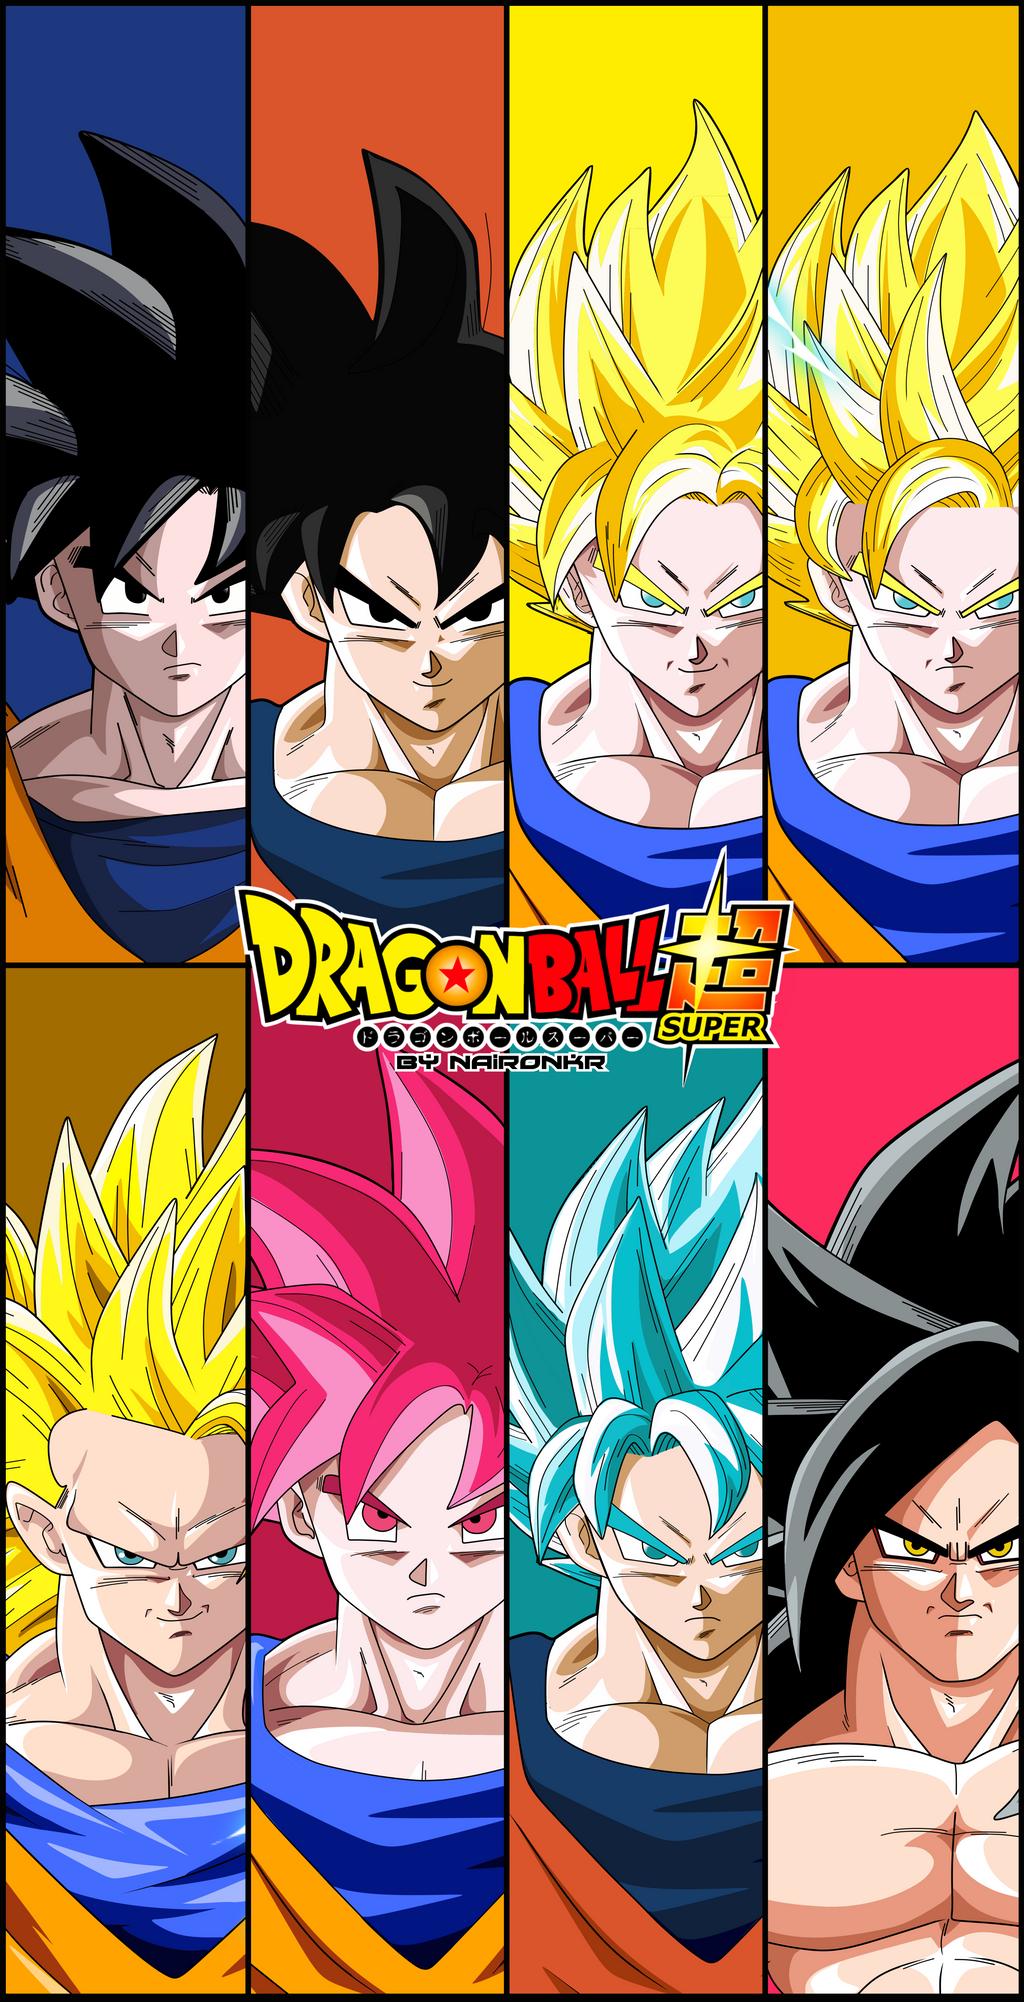 dragon ball super poster goku v.4 by naironkr on DeviantArt